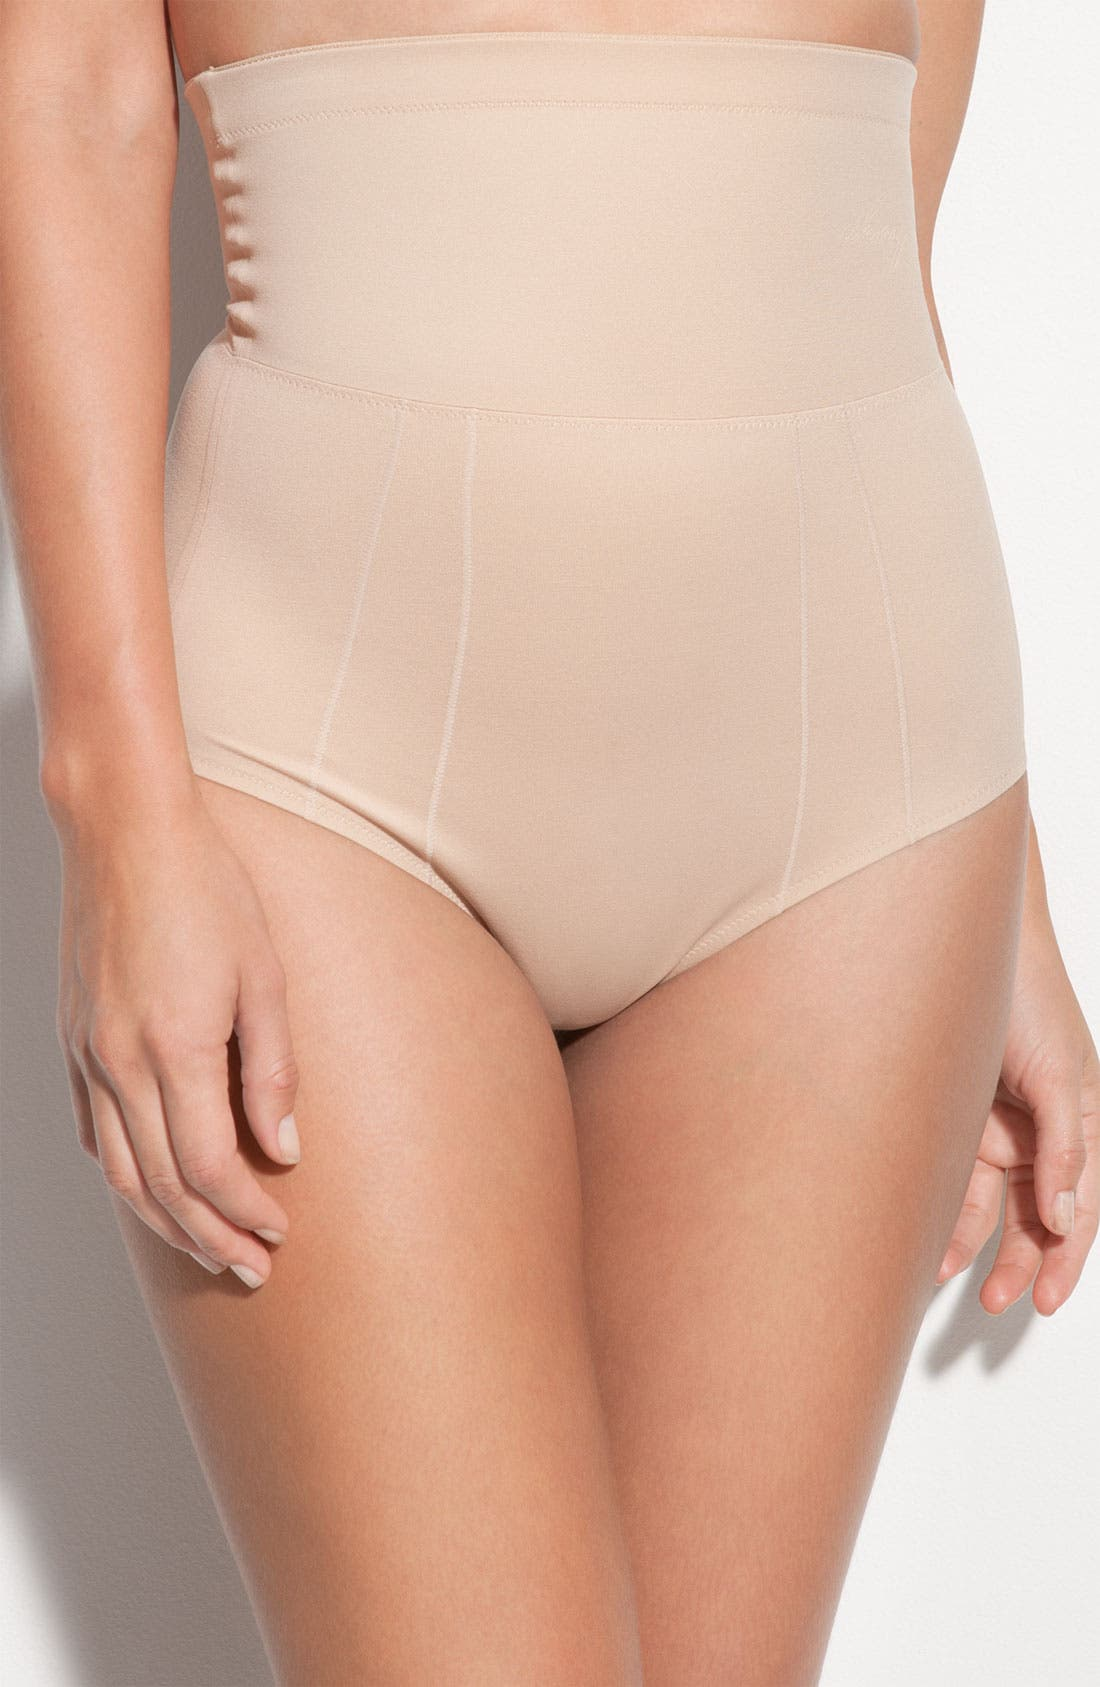 Main Image - DKNY 'Fusion' Thong Back Waist Cincher